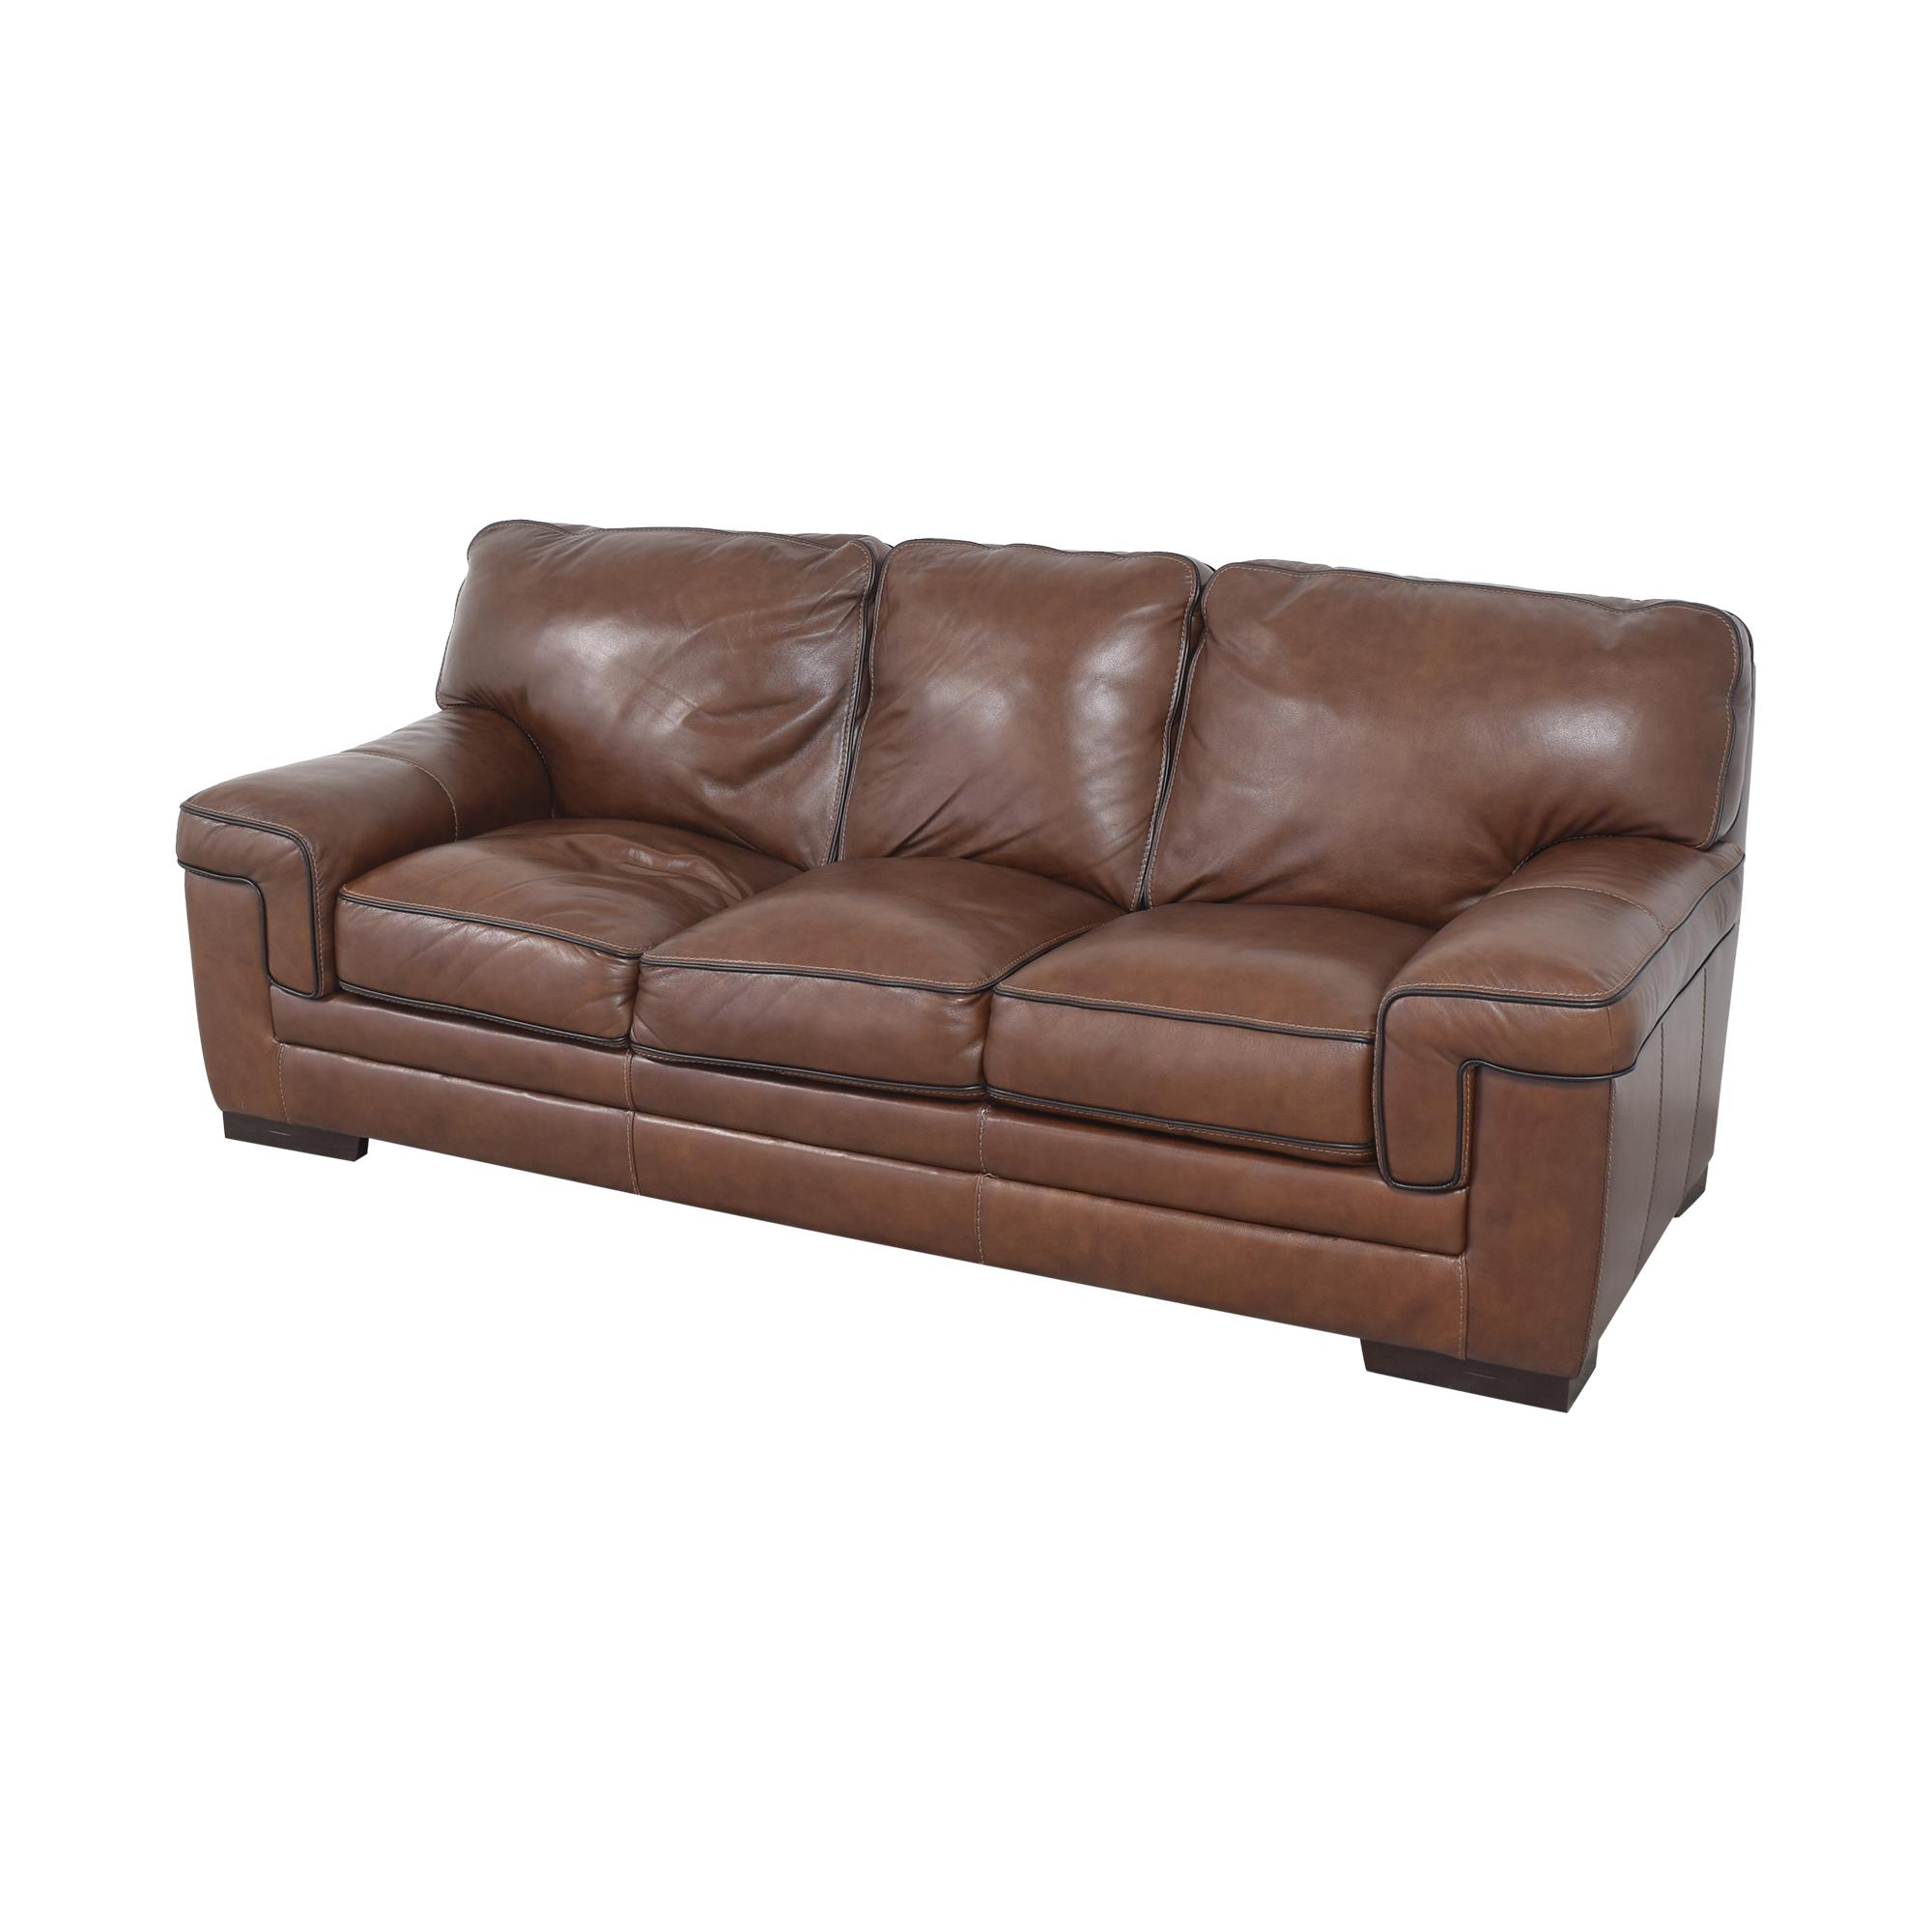 Raymour & Flanigan Raymour & Flanigan Colton Sofa price